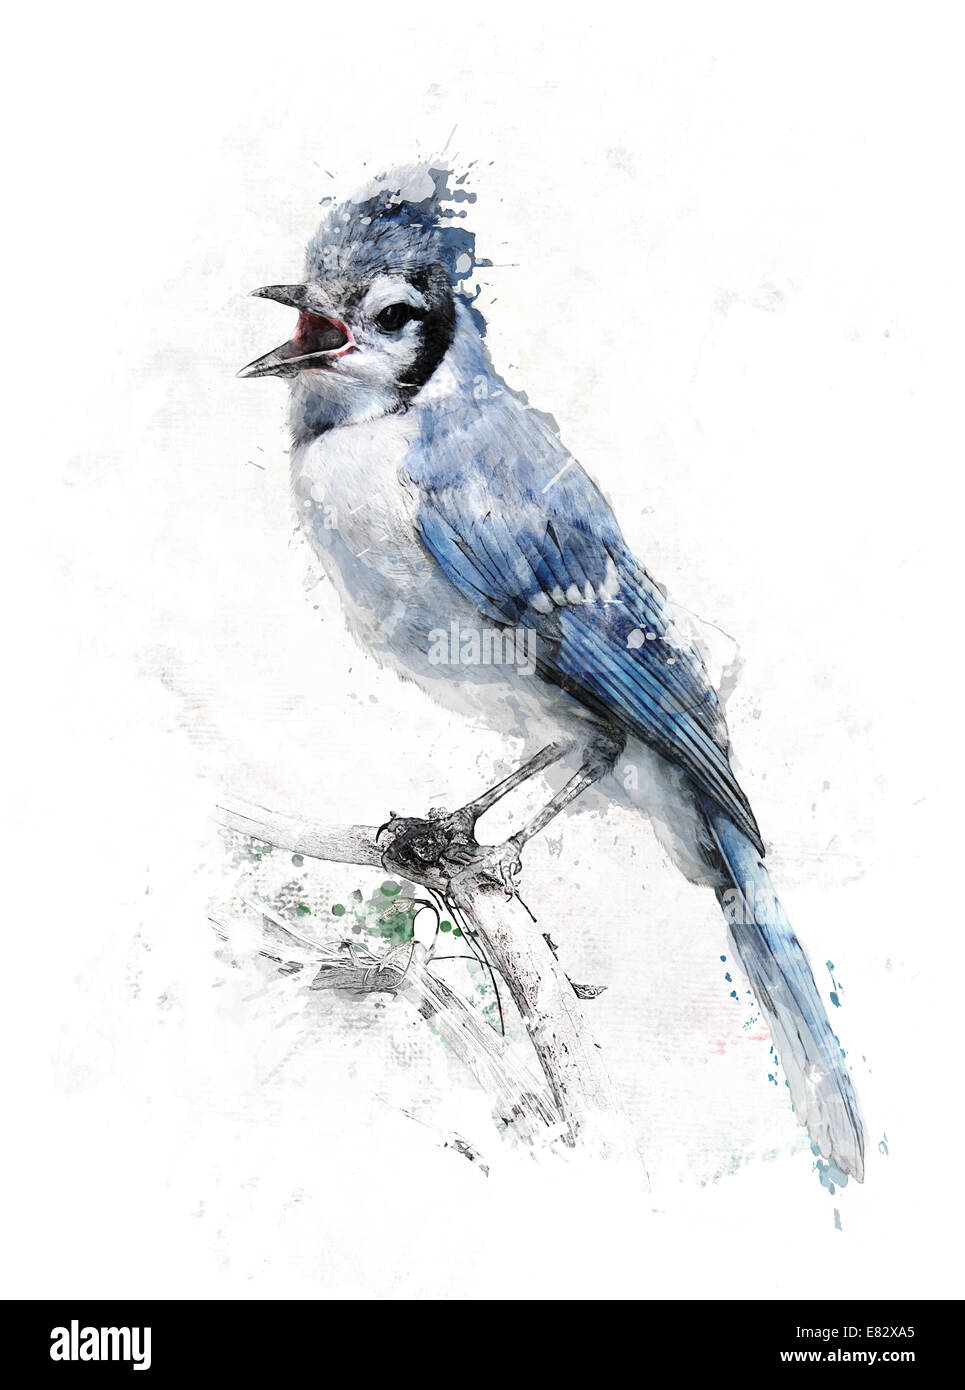 Watercolor Digital Painting Of Blue Jay Bird Stock Photo